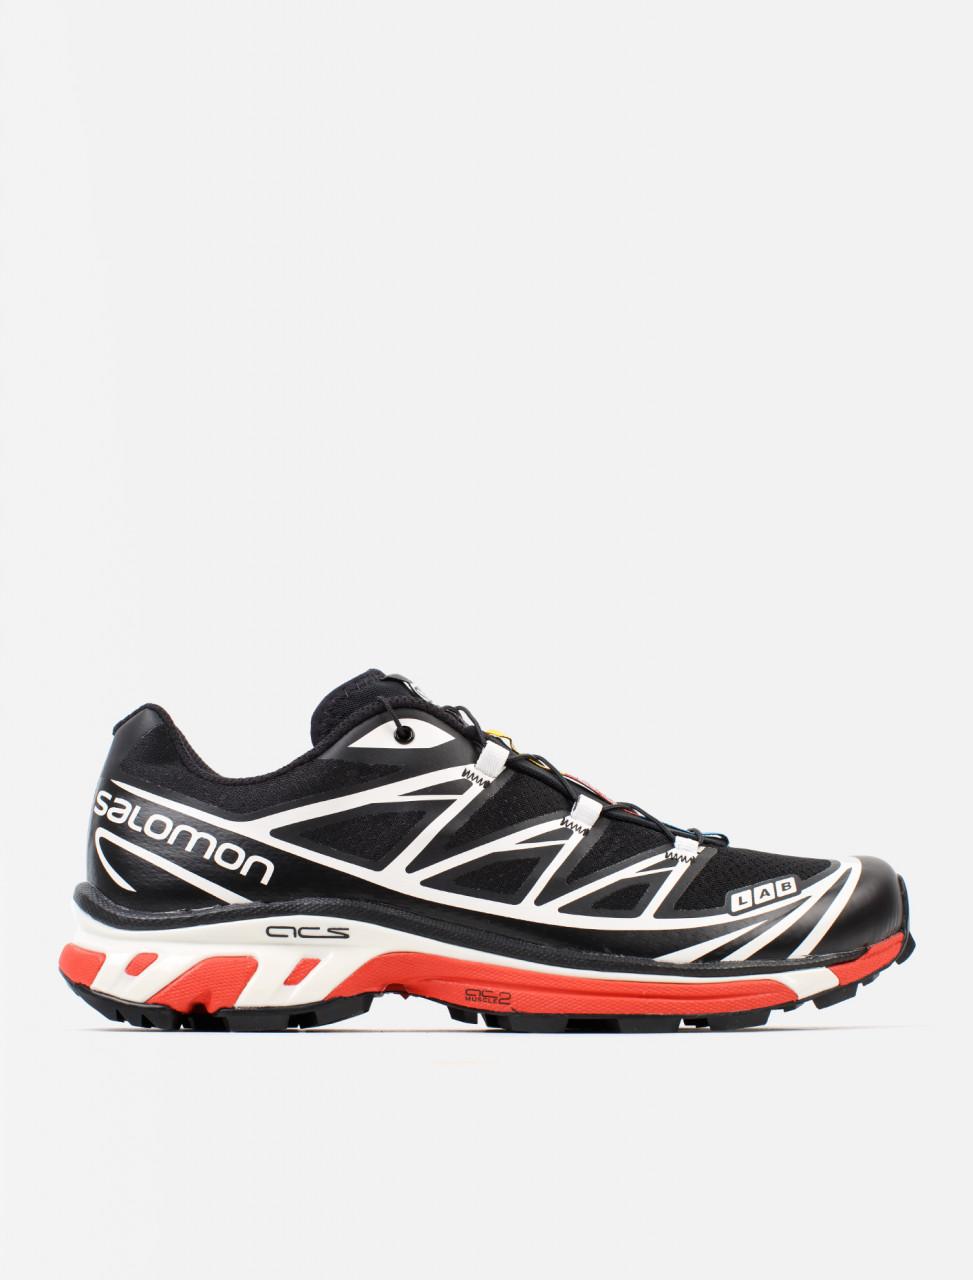 S/LAB XT-6 SOFTGROUND LT ADV Sneaker